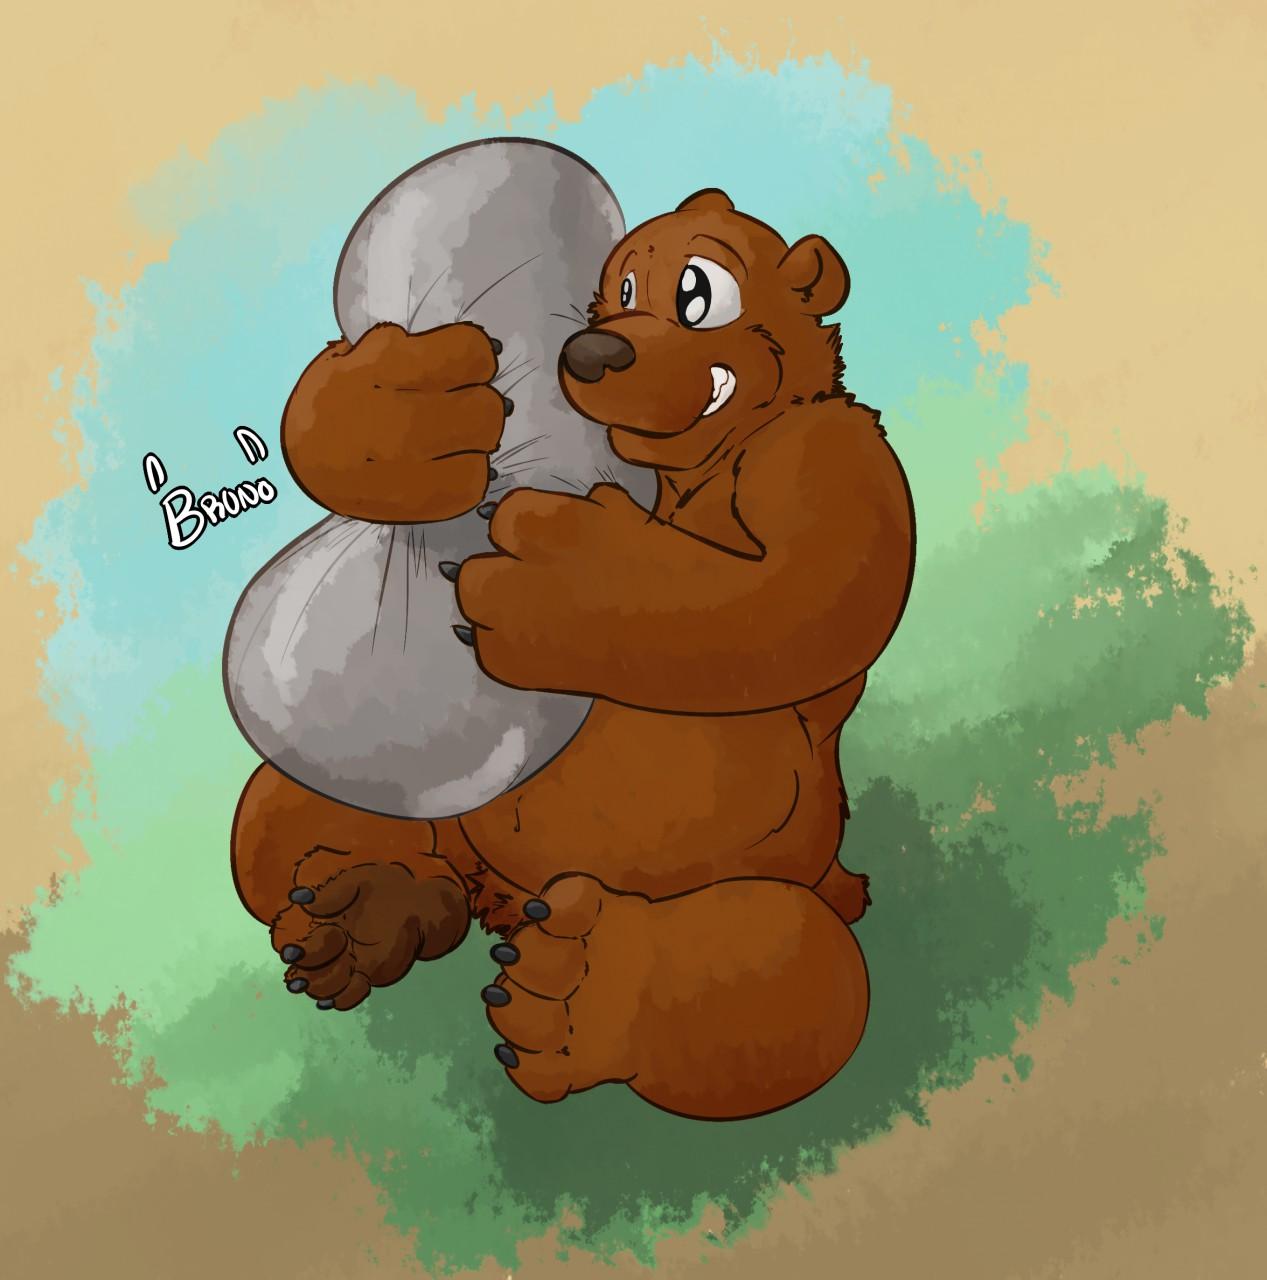 Bear cartoon XXX zoophile looking